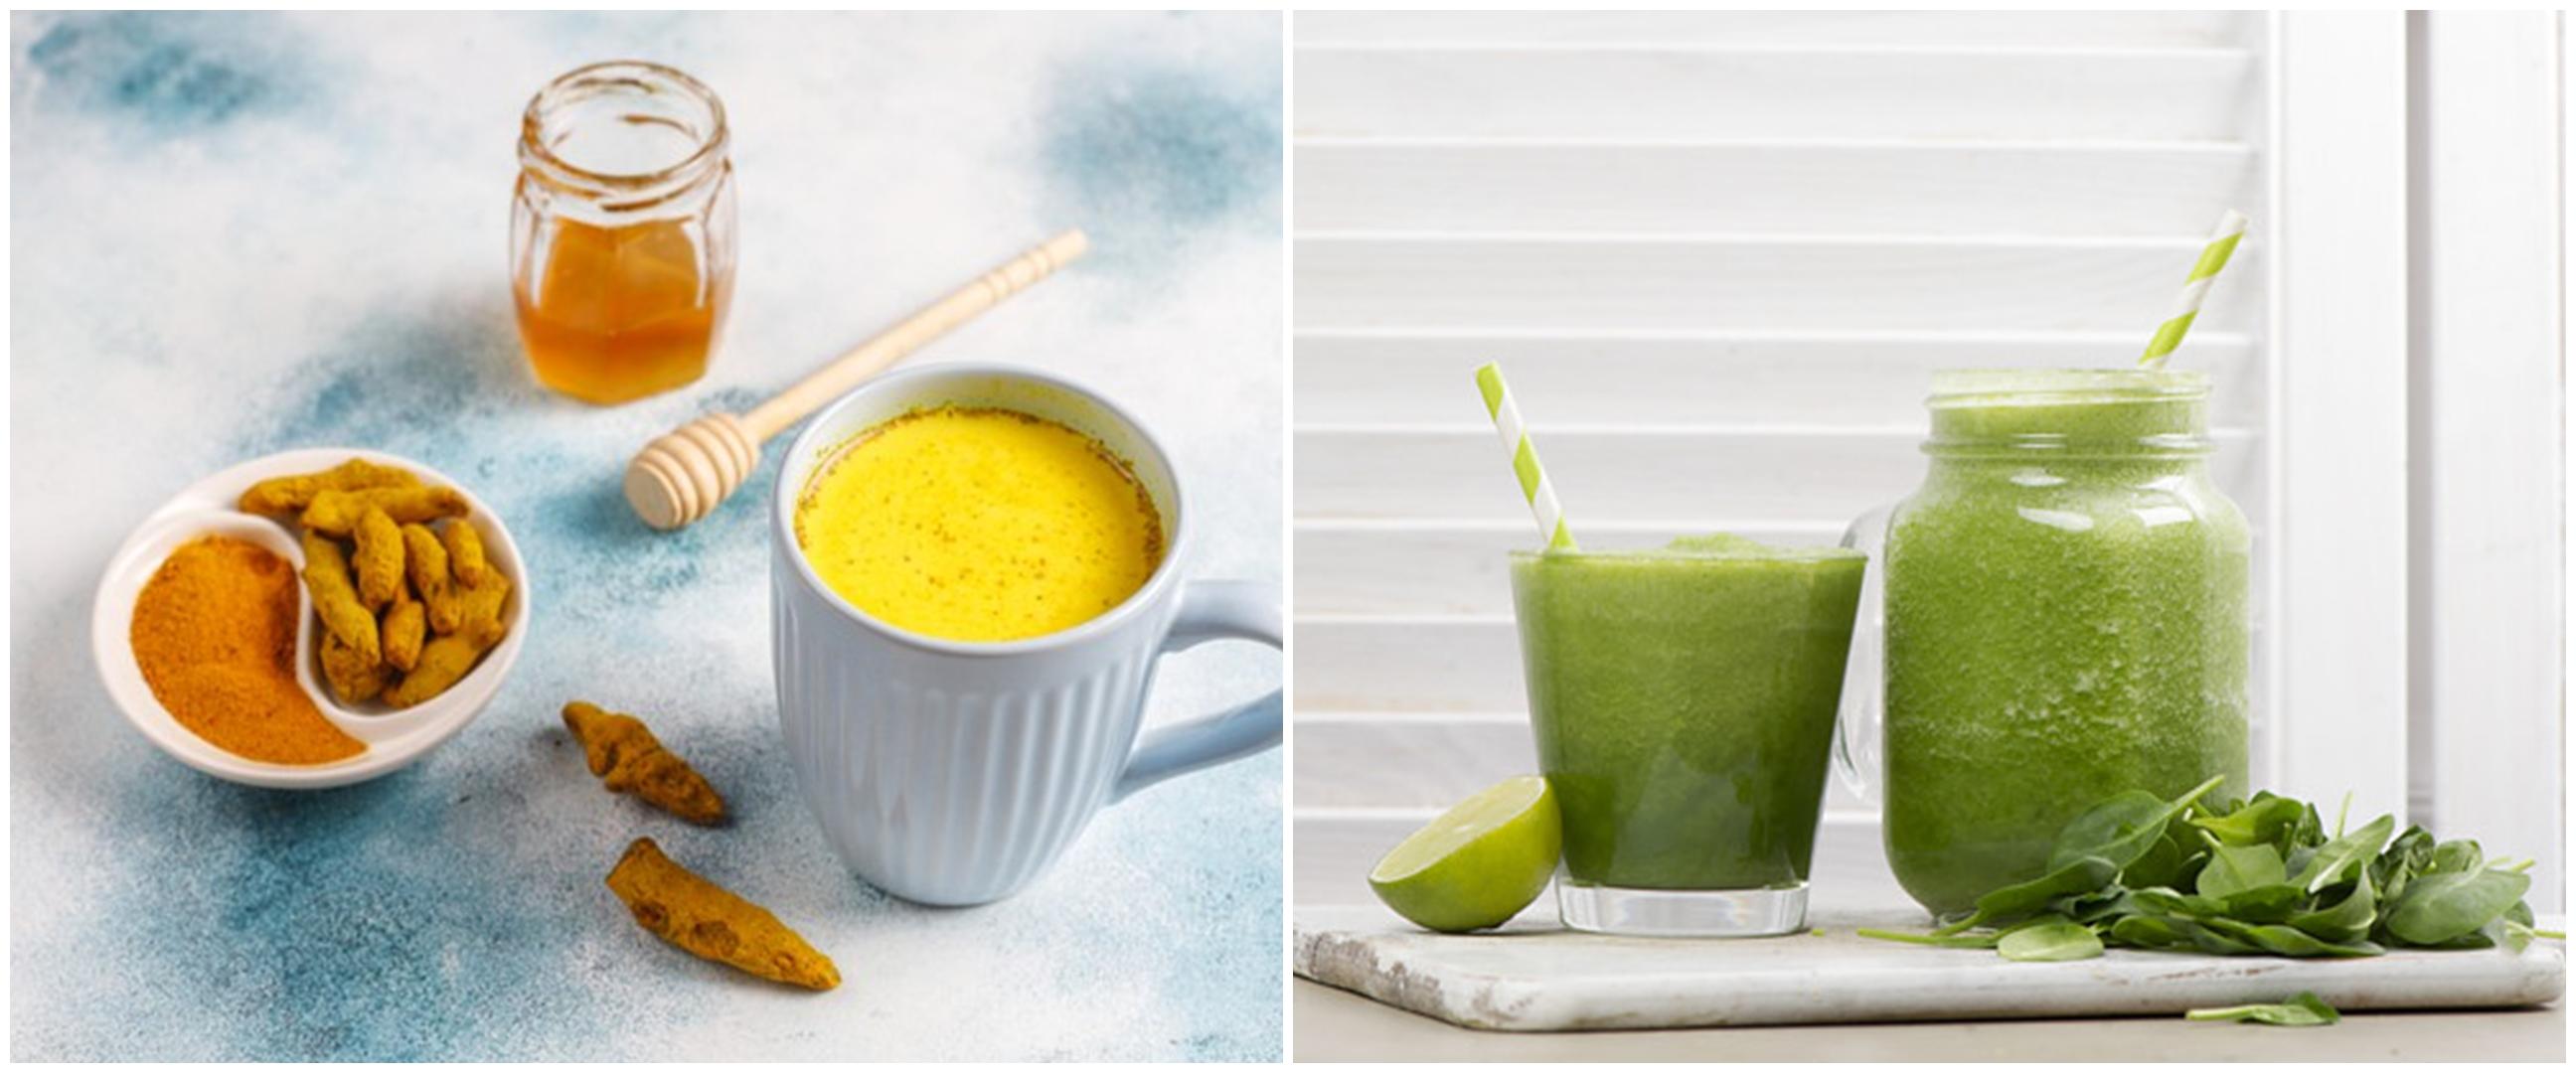 6 Minuman sehat untuk ibu menyusui, bisa bantu jaga imun tubuh